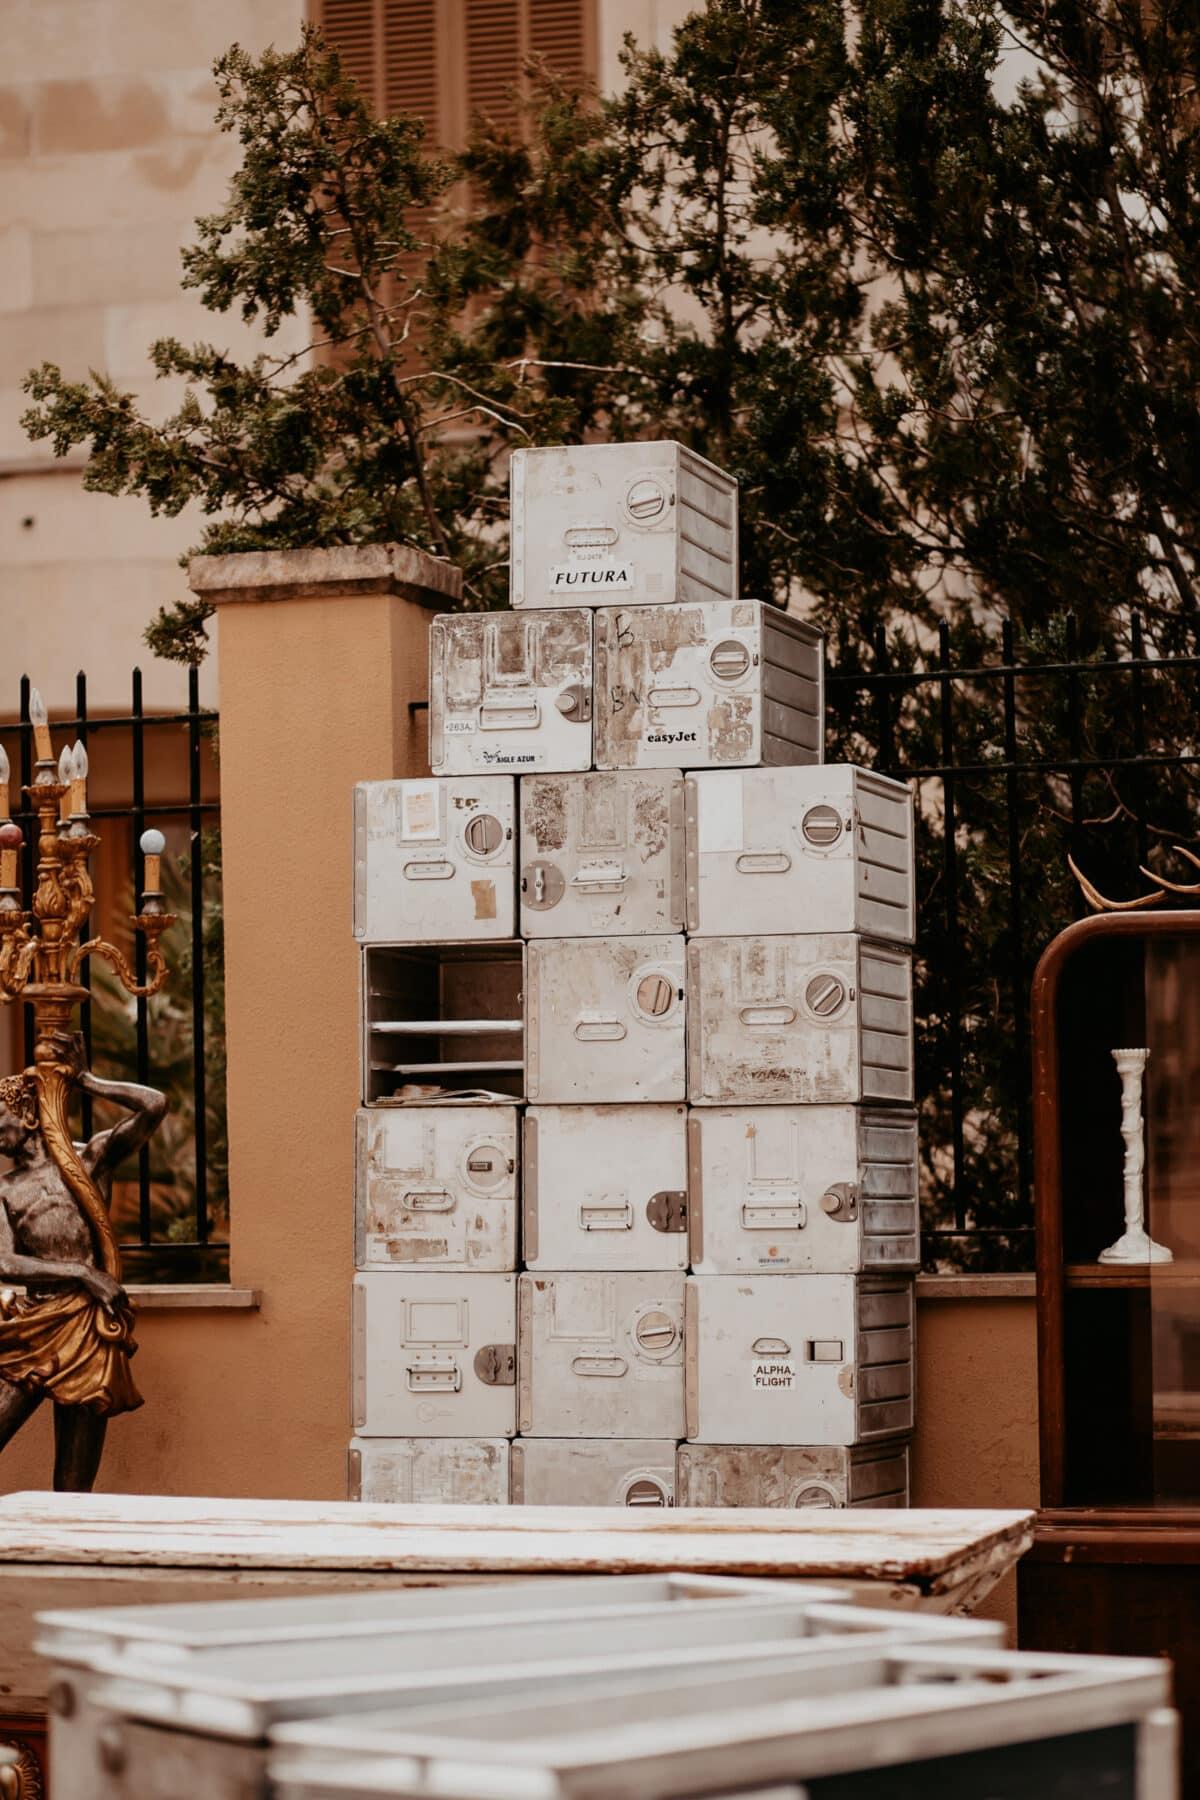 Old airline catering boxes Mallorca flea market